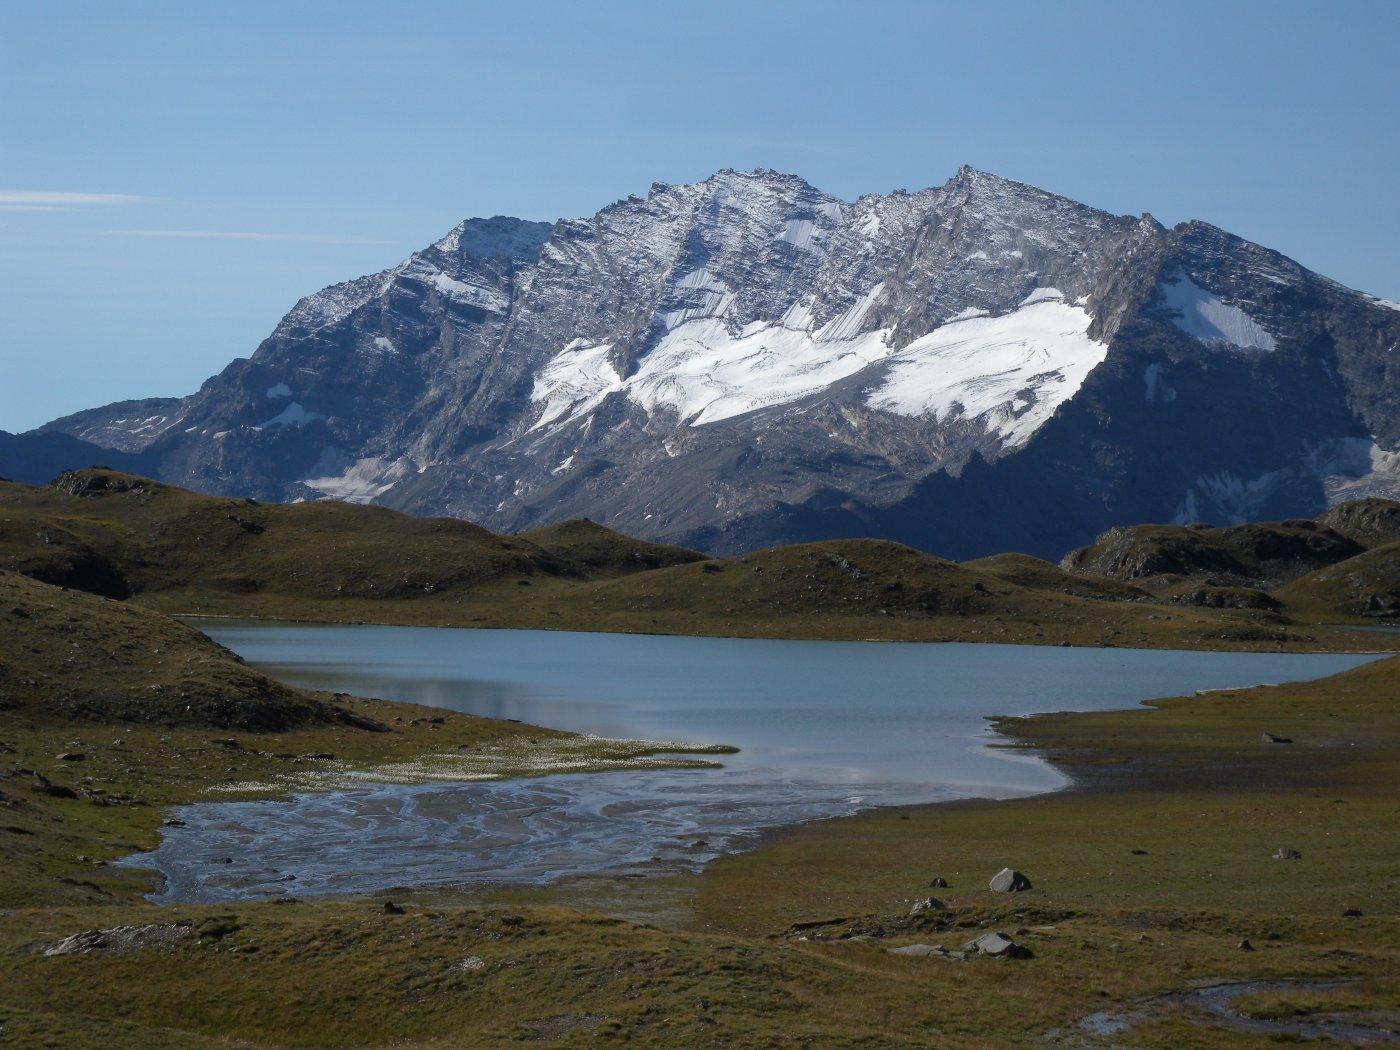 Leynir (Punta) e Punta del Bes dai Piani del Nivolet per il Colle Rosset 2015-08-20